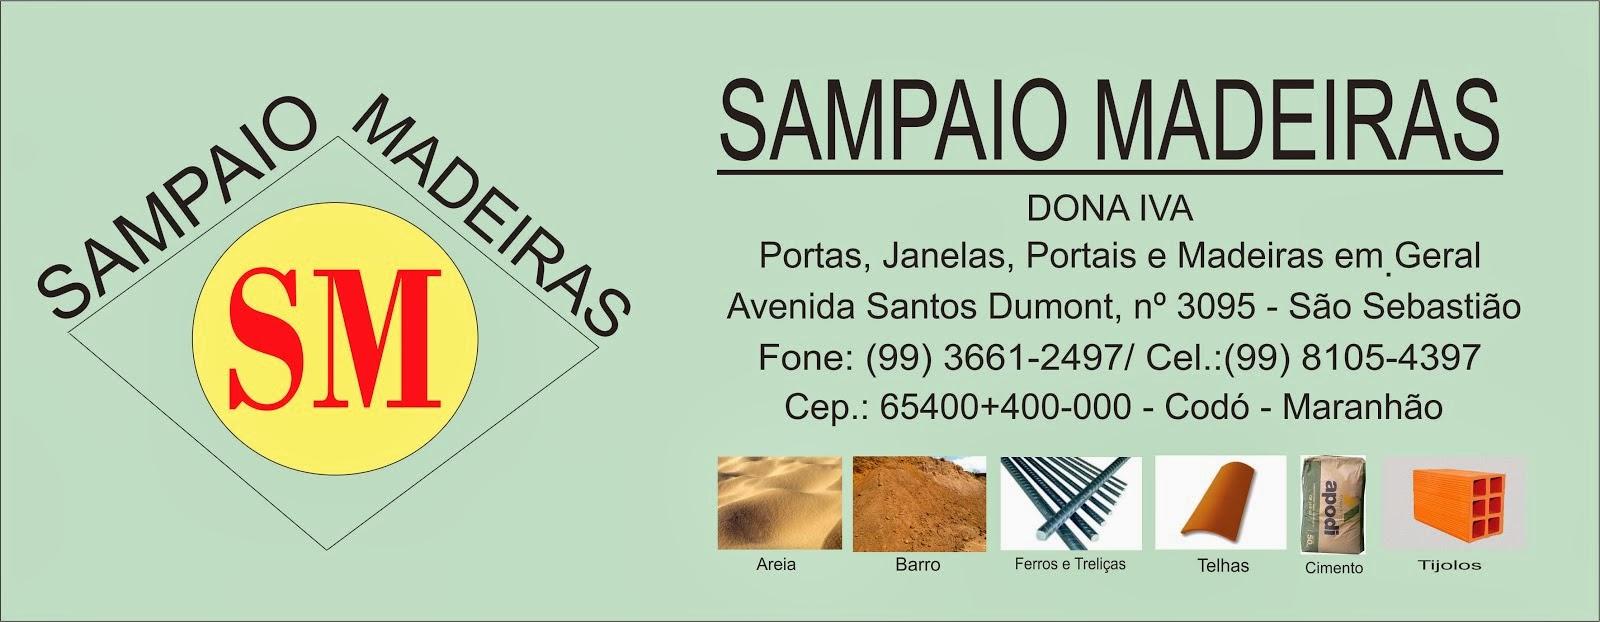 SAMPAIO MADEIRAS - IVA SAMPAIO